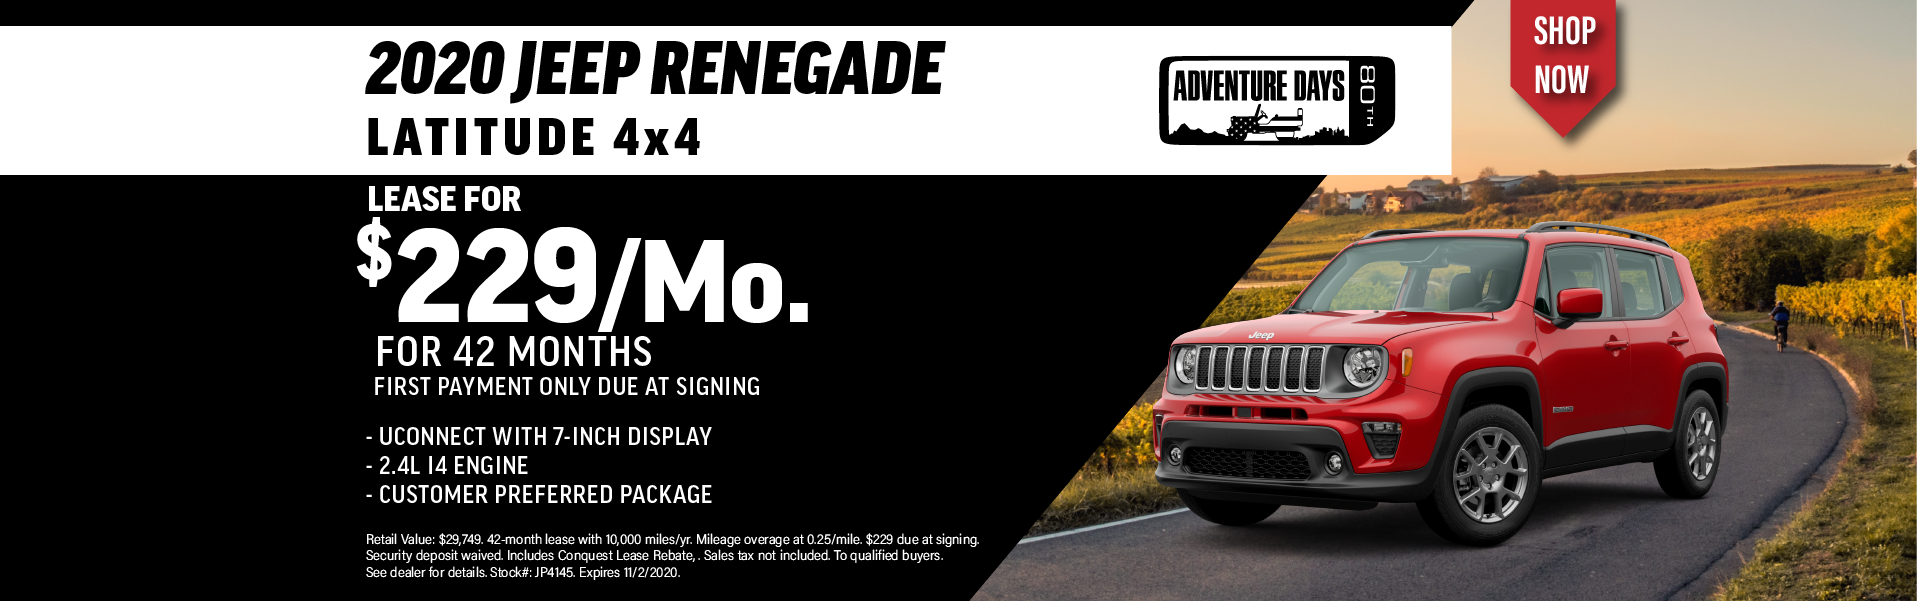 Quirk 2020 Jeep Renegade- October 2020